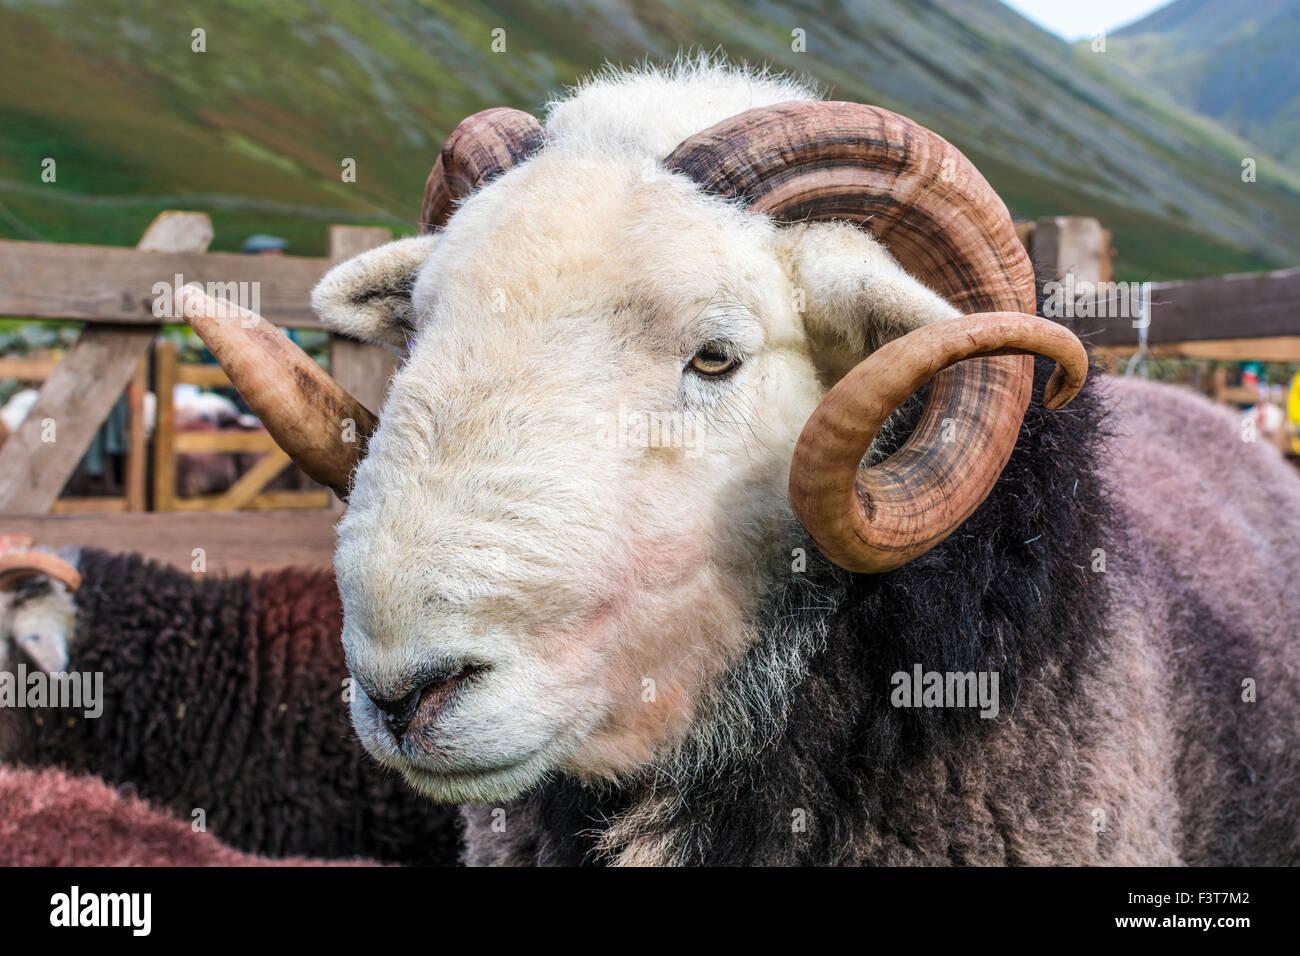 Herdwick ram at Wasdale Shepherds Meet, Cumbria. - Stock Image